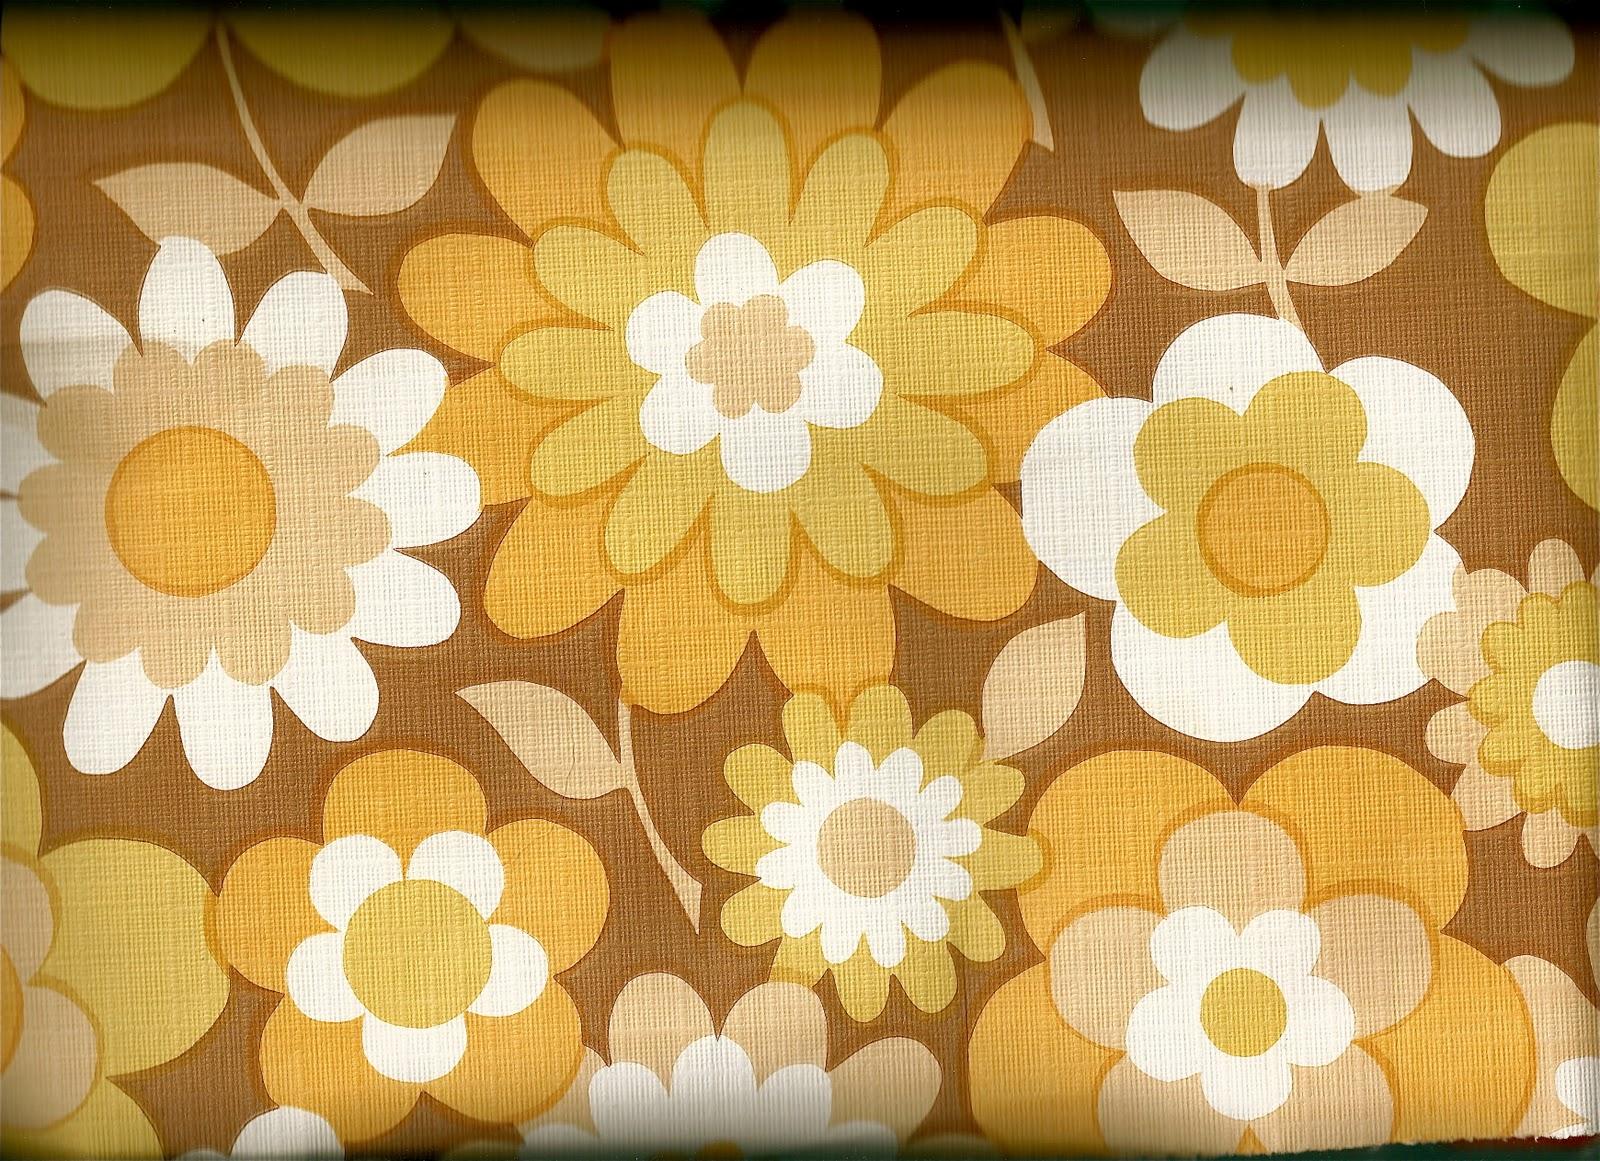 70'S Wallpaper Backgrounds - WallpaperSafari